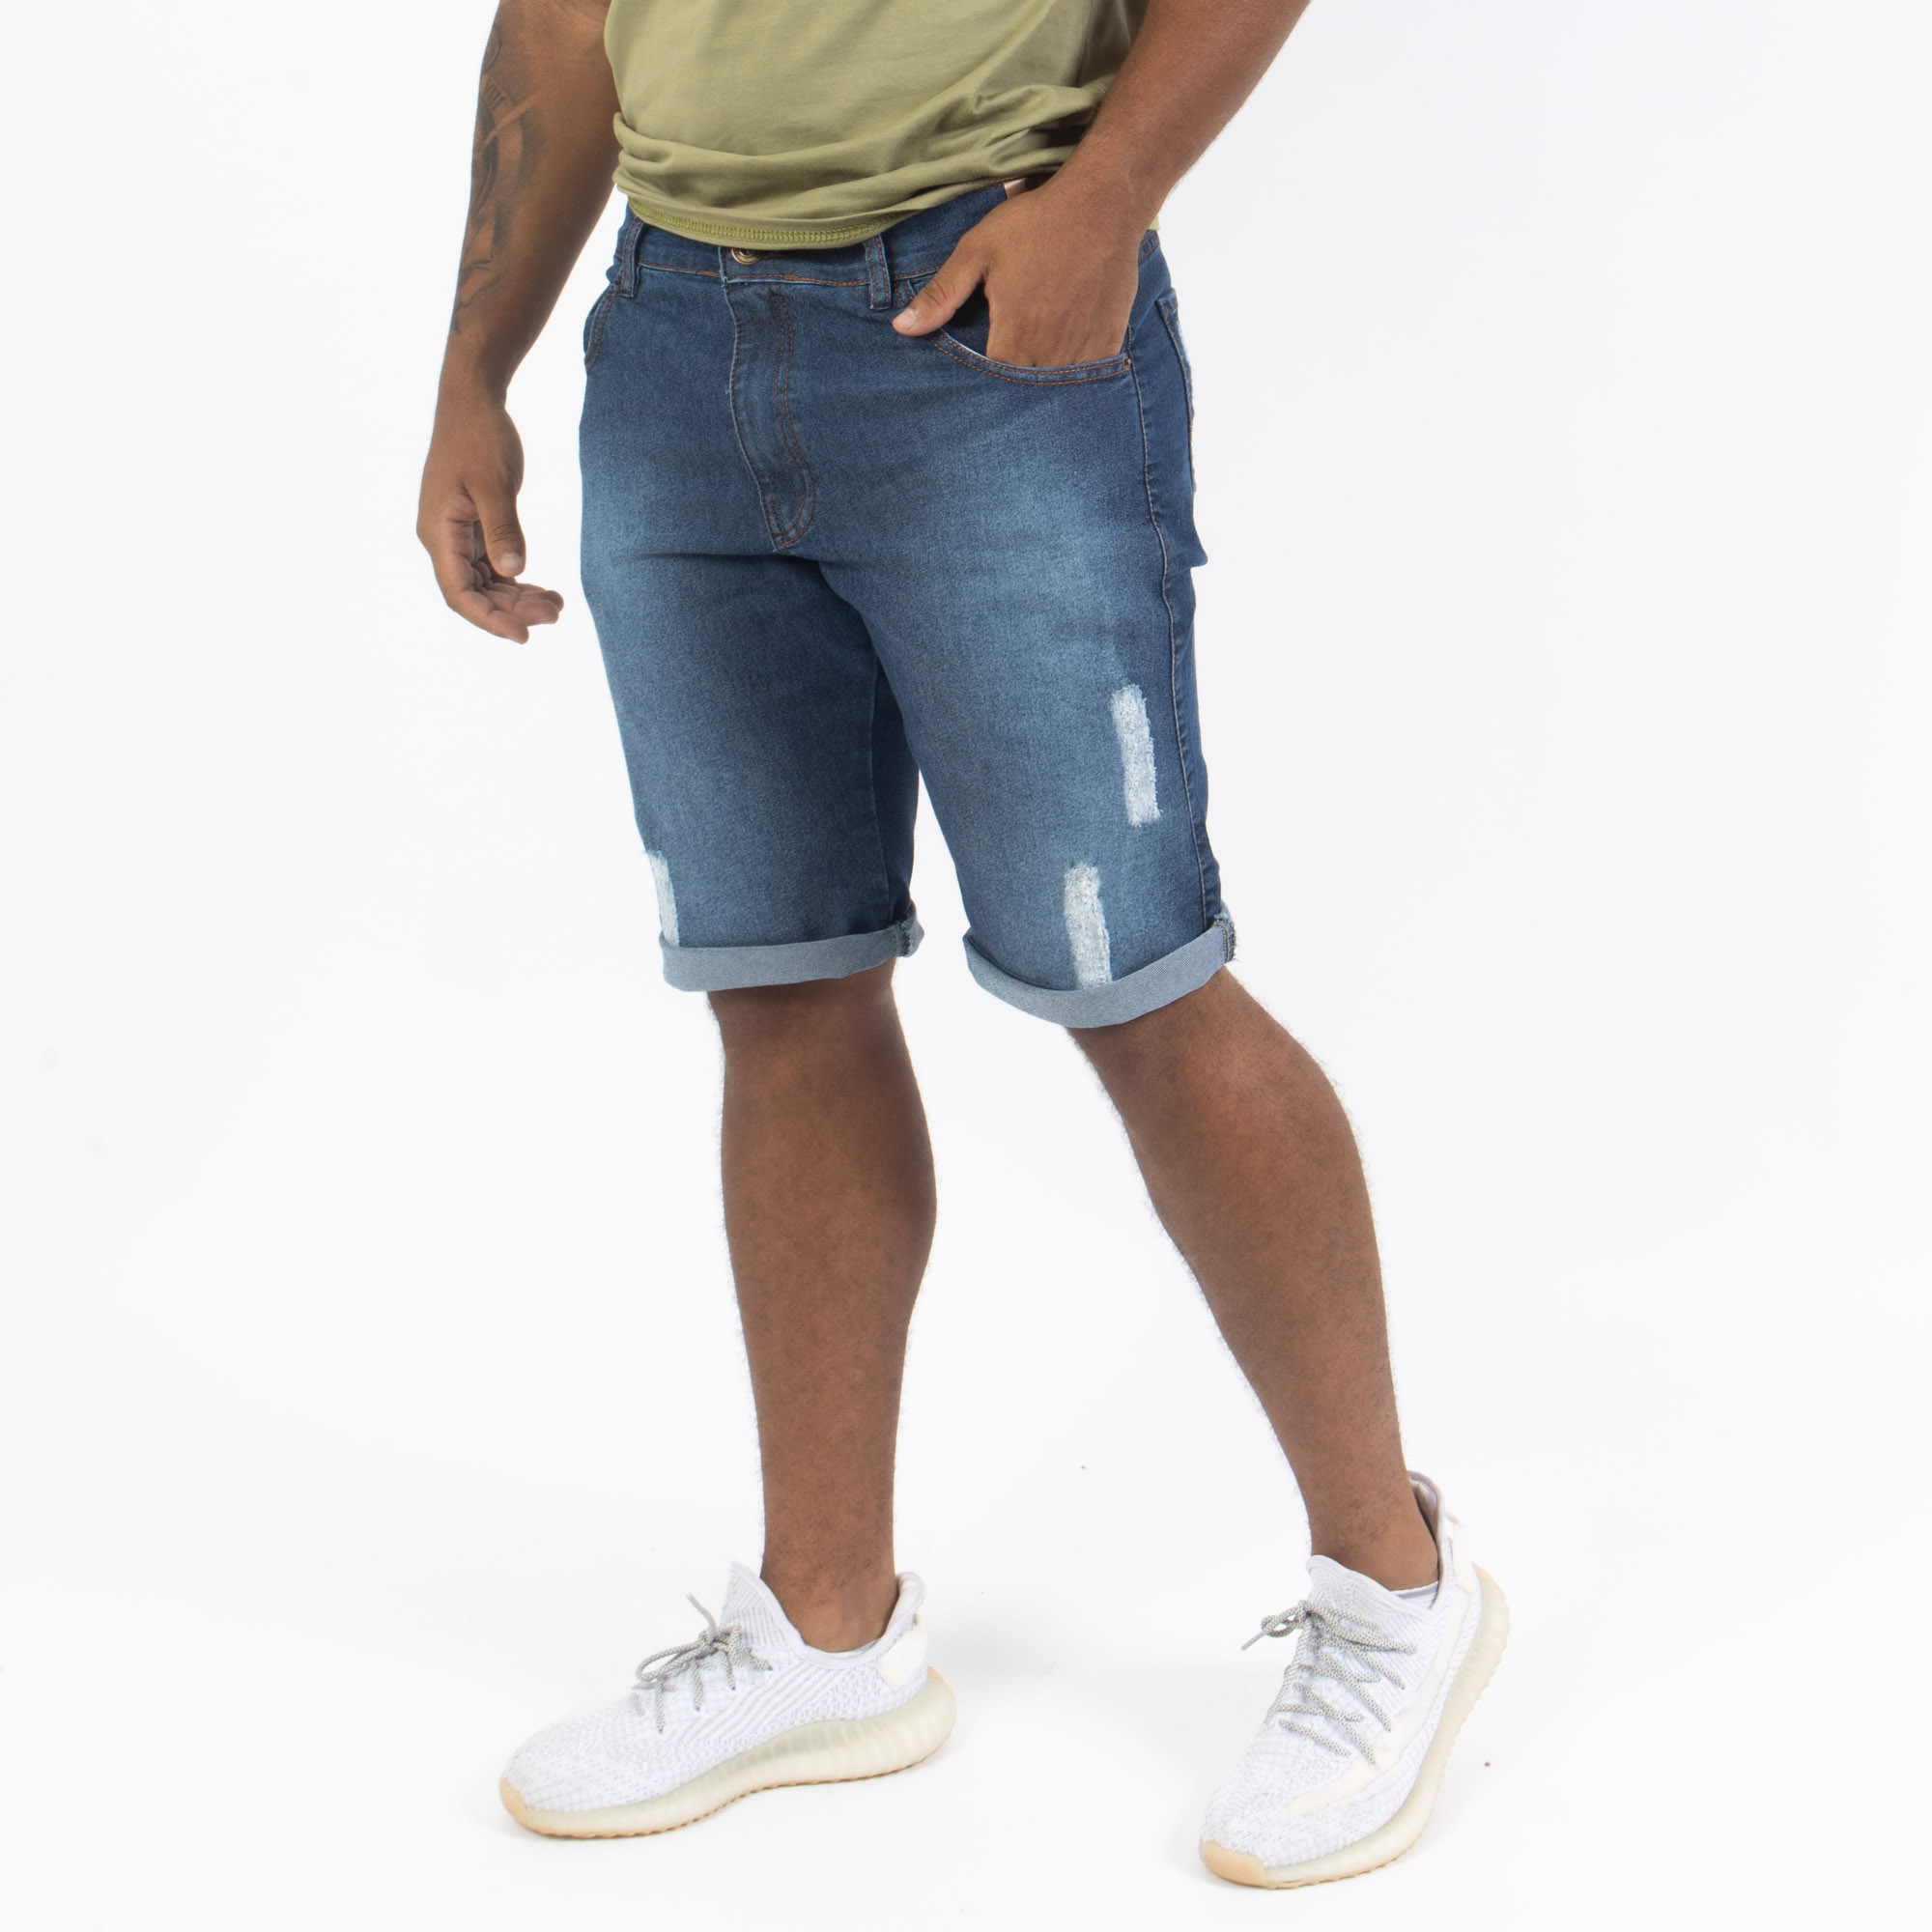 Bermuda jeans com Destroyd -Oslen